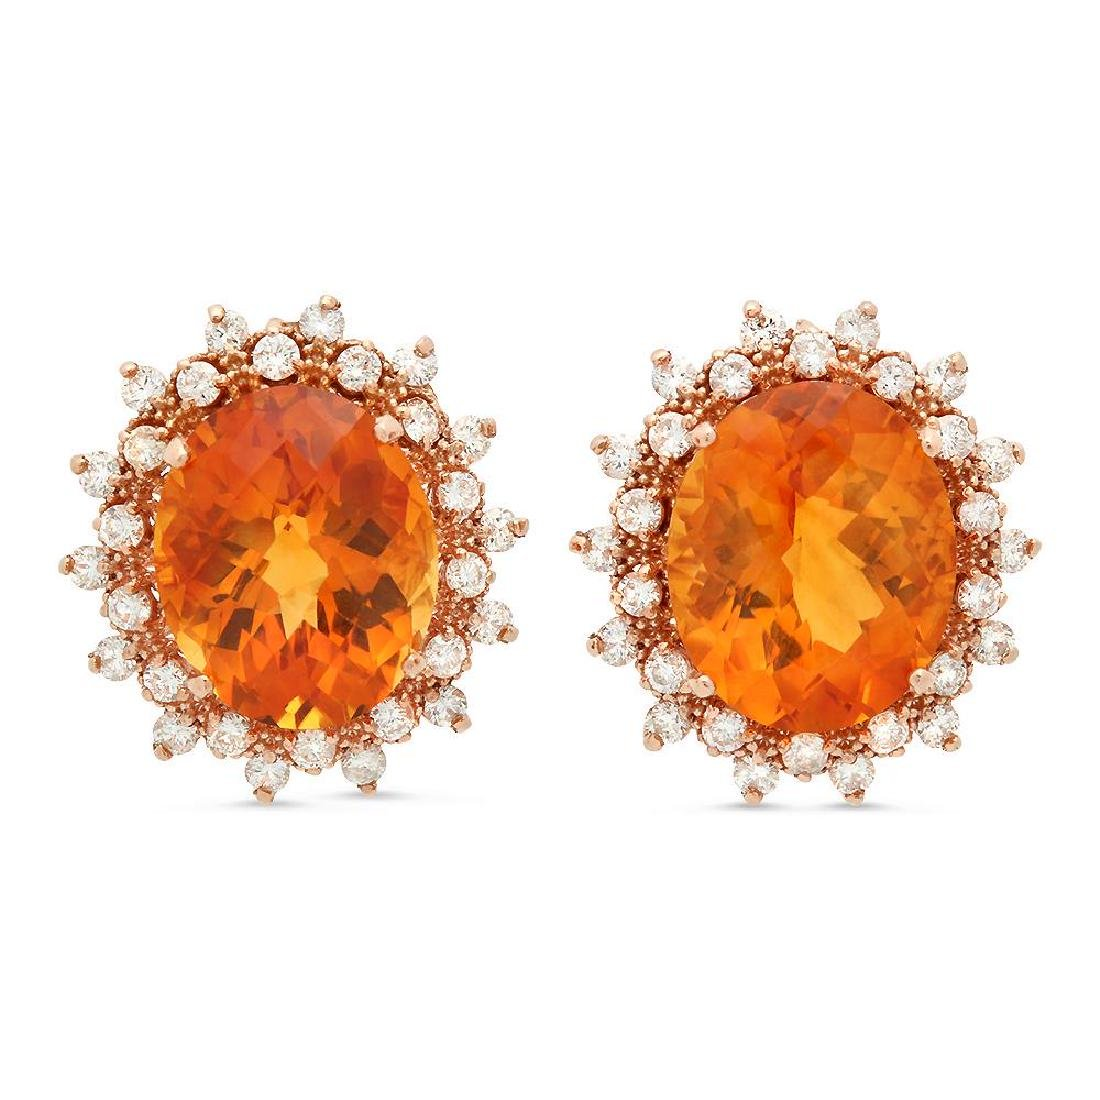 14K Gold 11.15ct Citrine 1.40cts Diamond Earrings